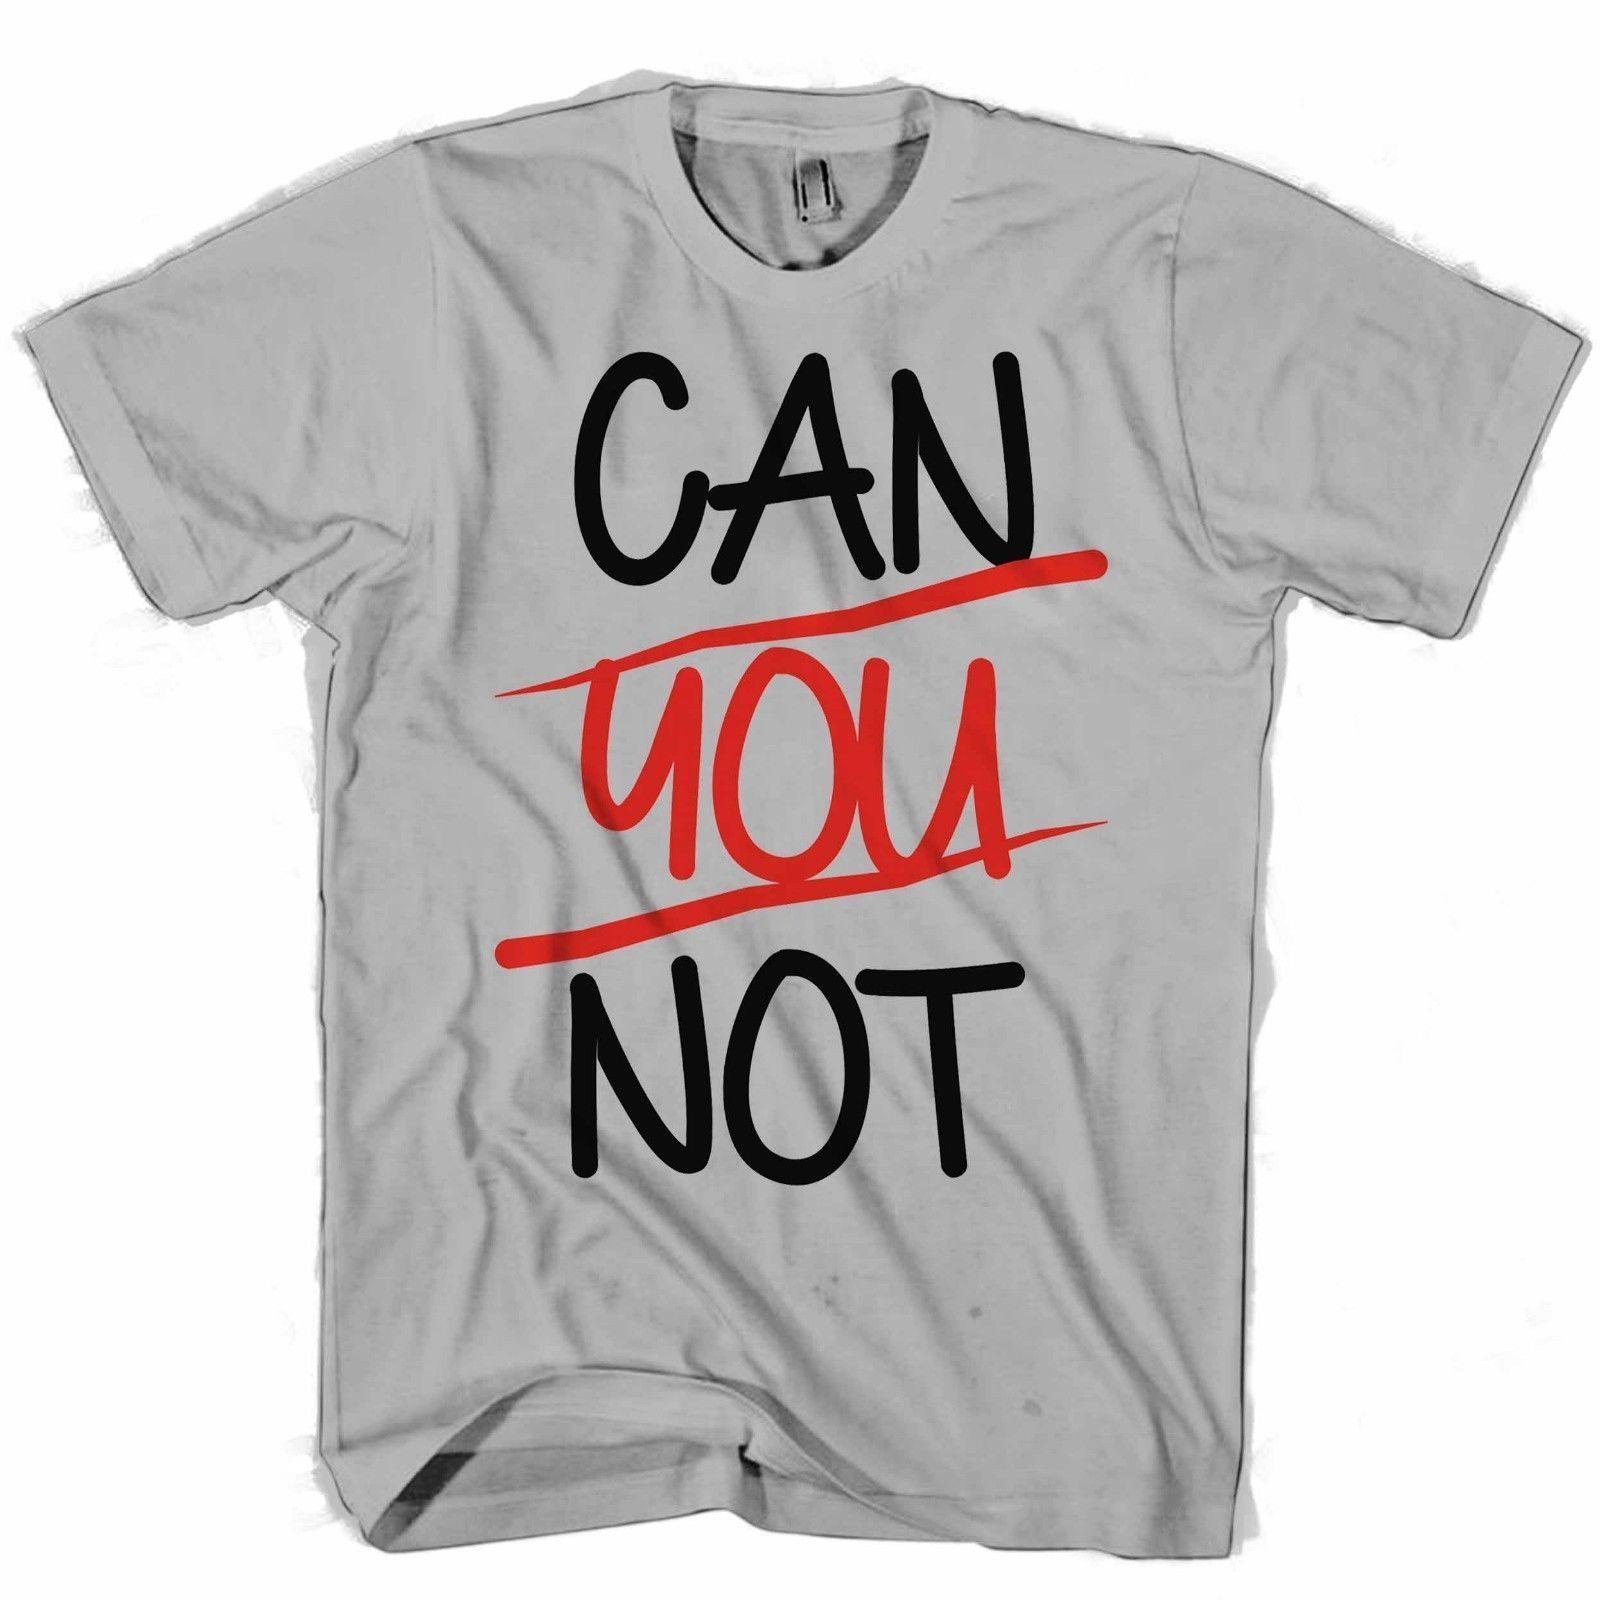 064c451a Can You Not Quotes Men's / Women's T Shirt Jersey Print T-shirt ...